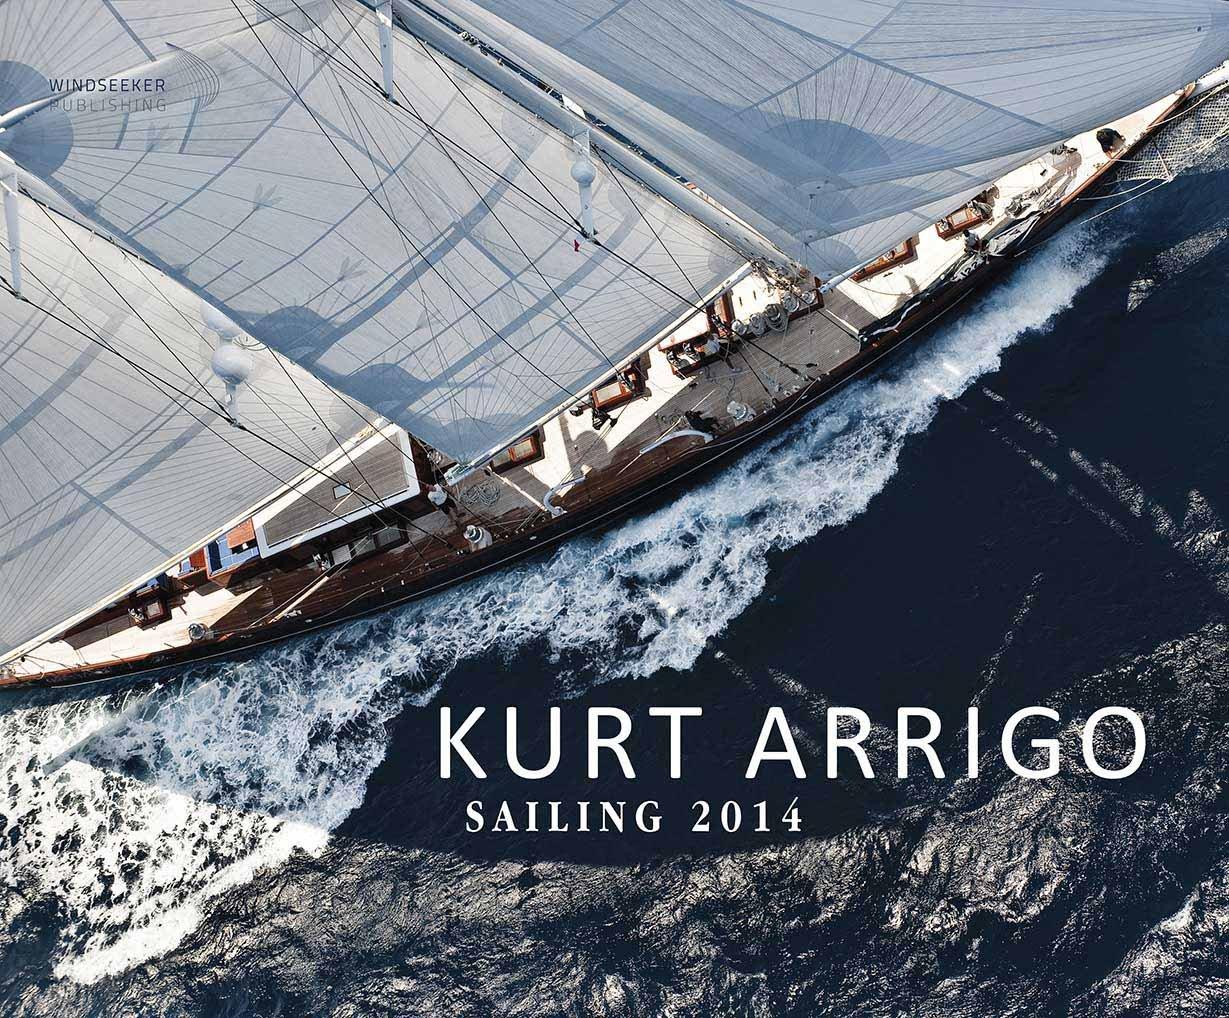 kurt-arrigo-sailing-2014